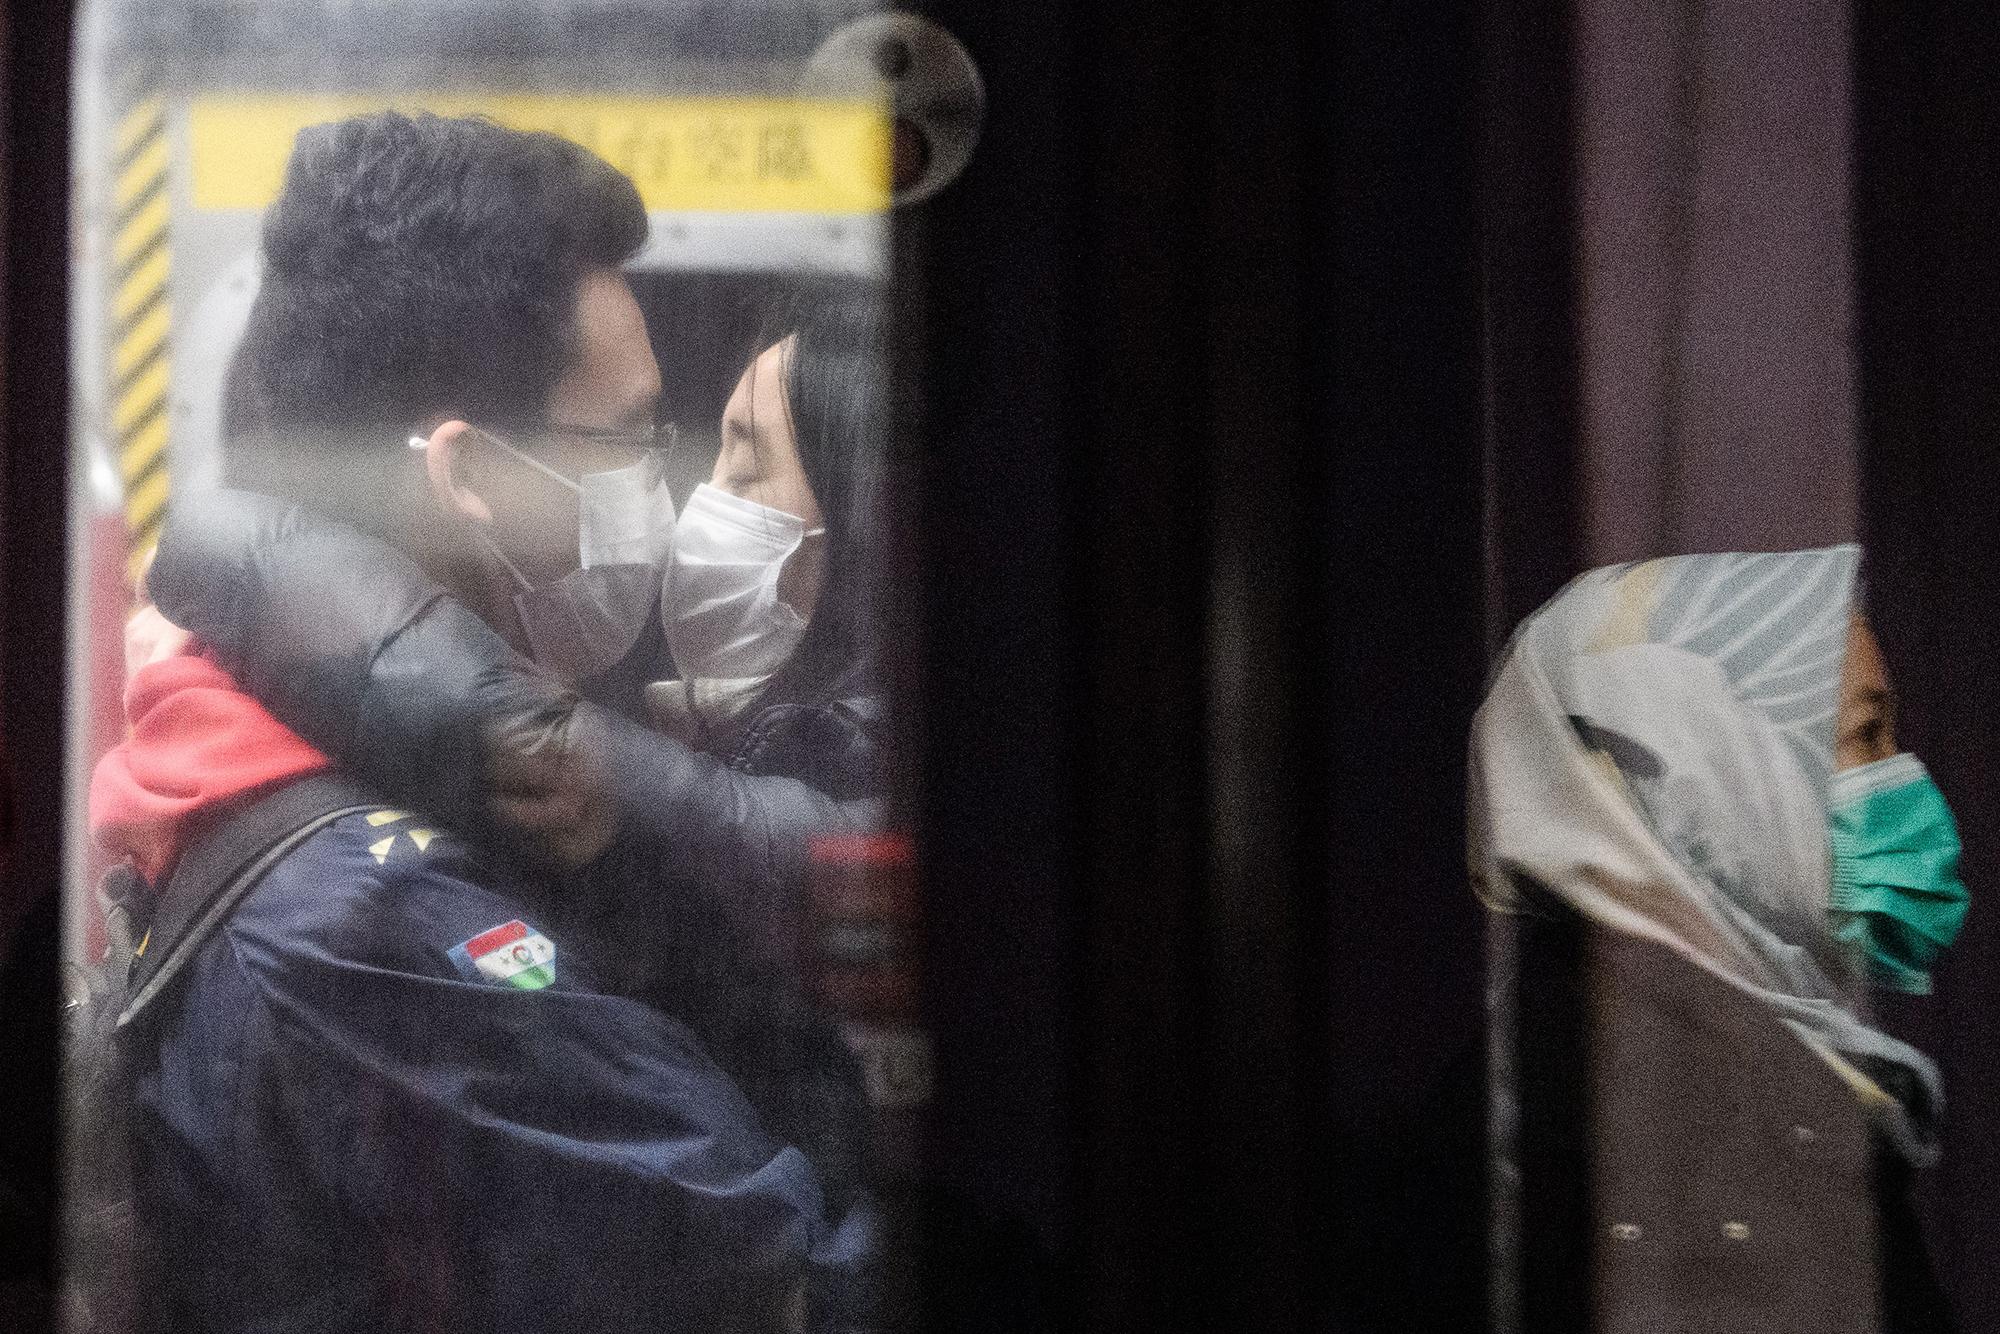 Wuhan coronavirus can be transmitted through contact, China says